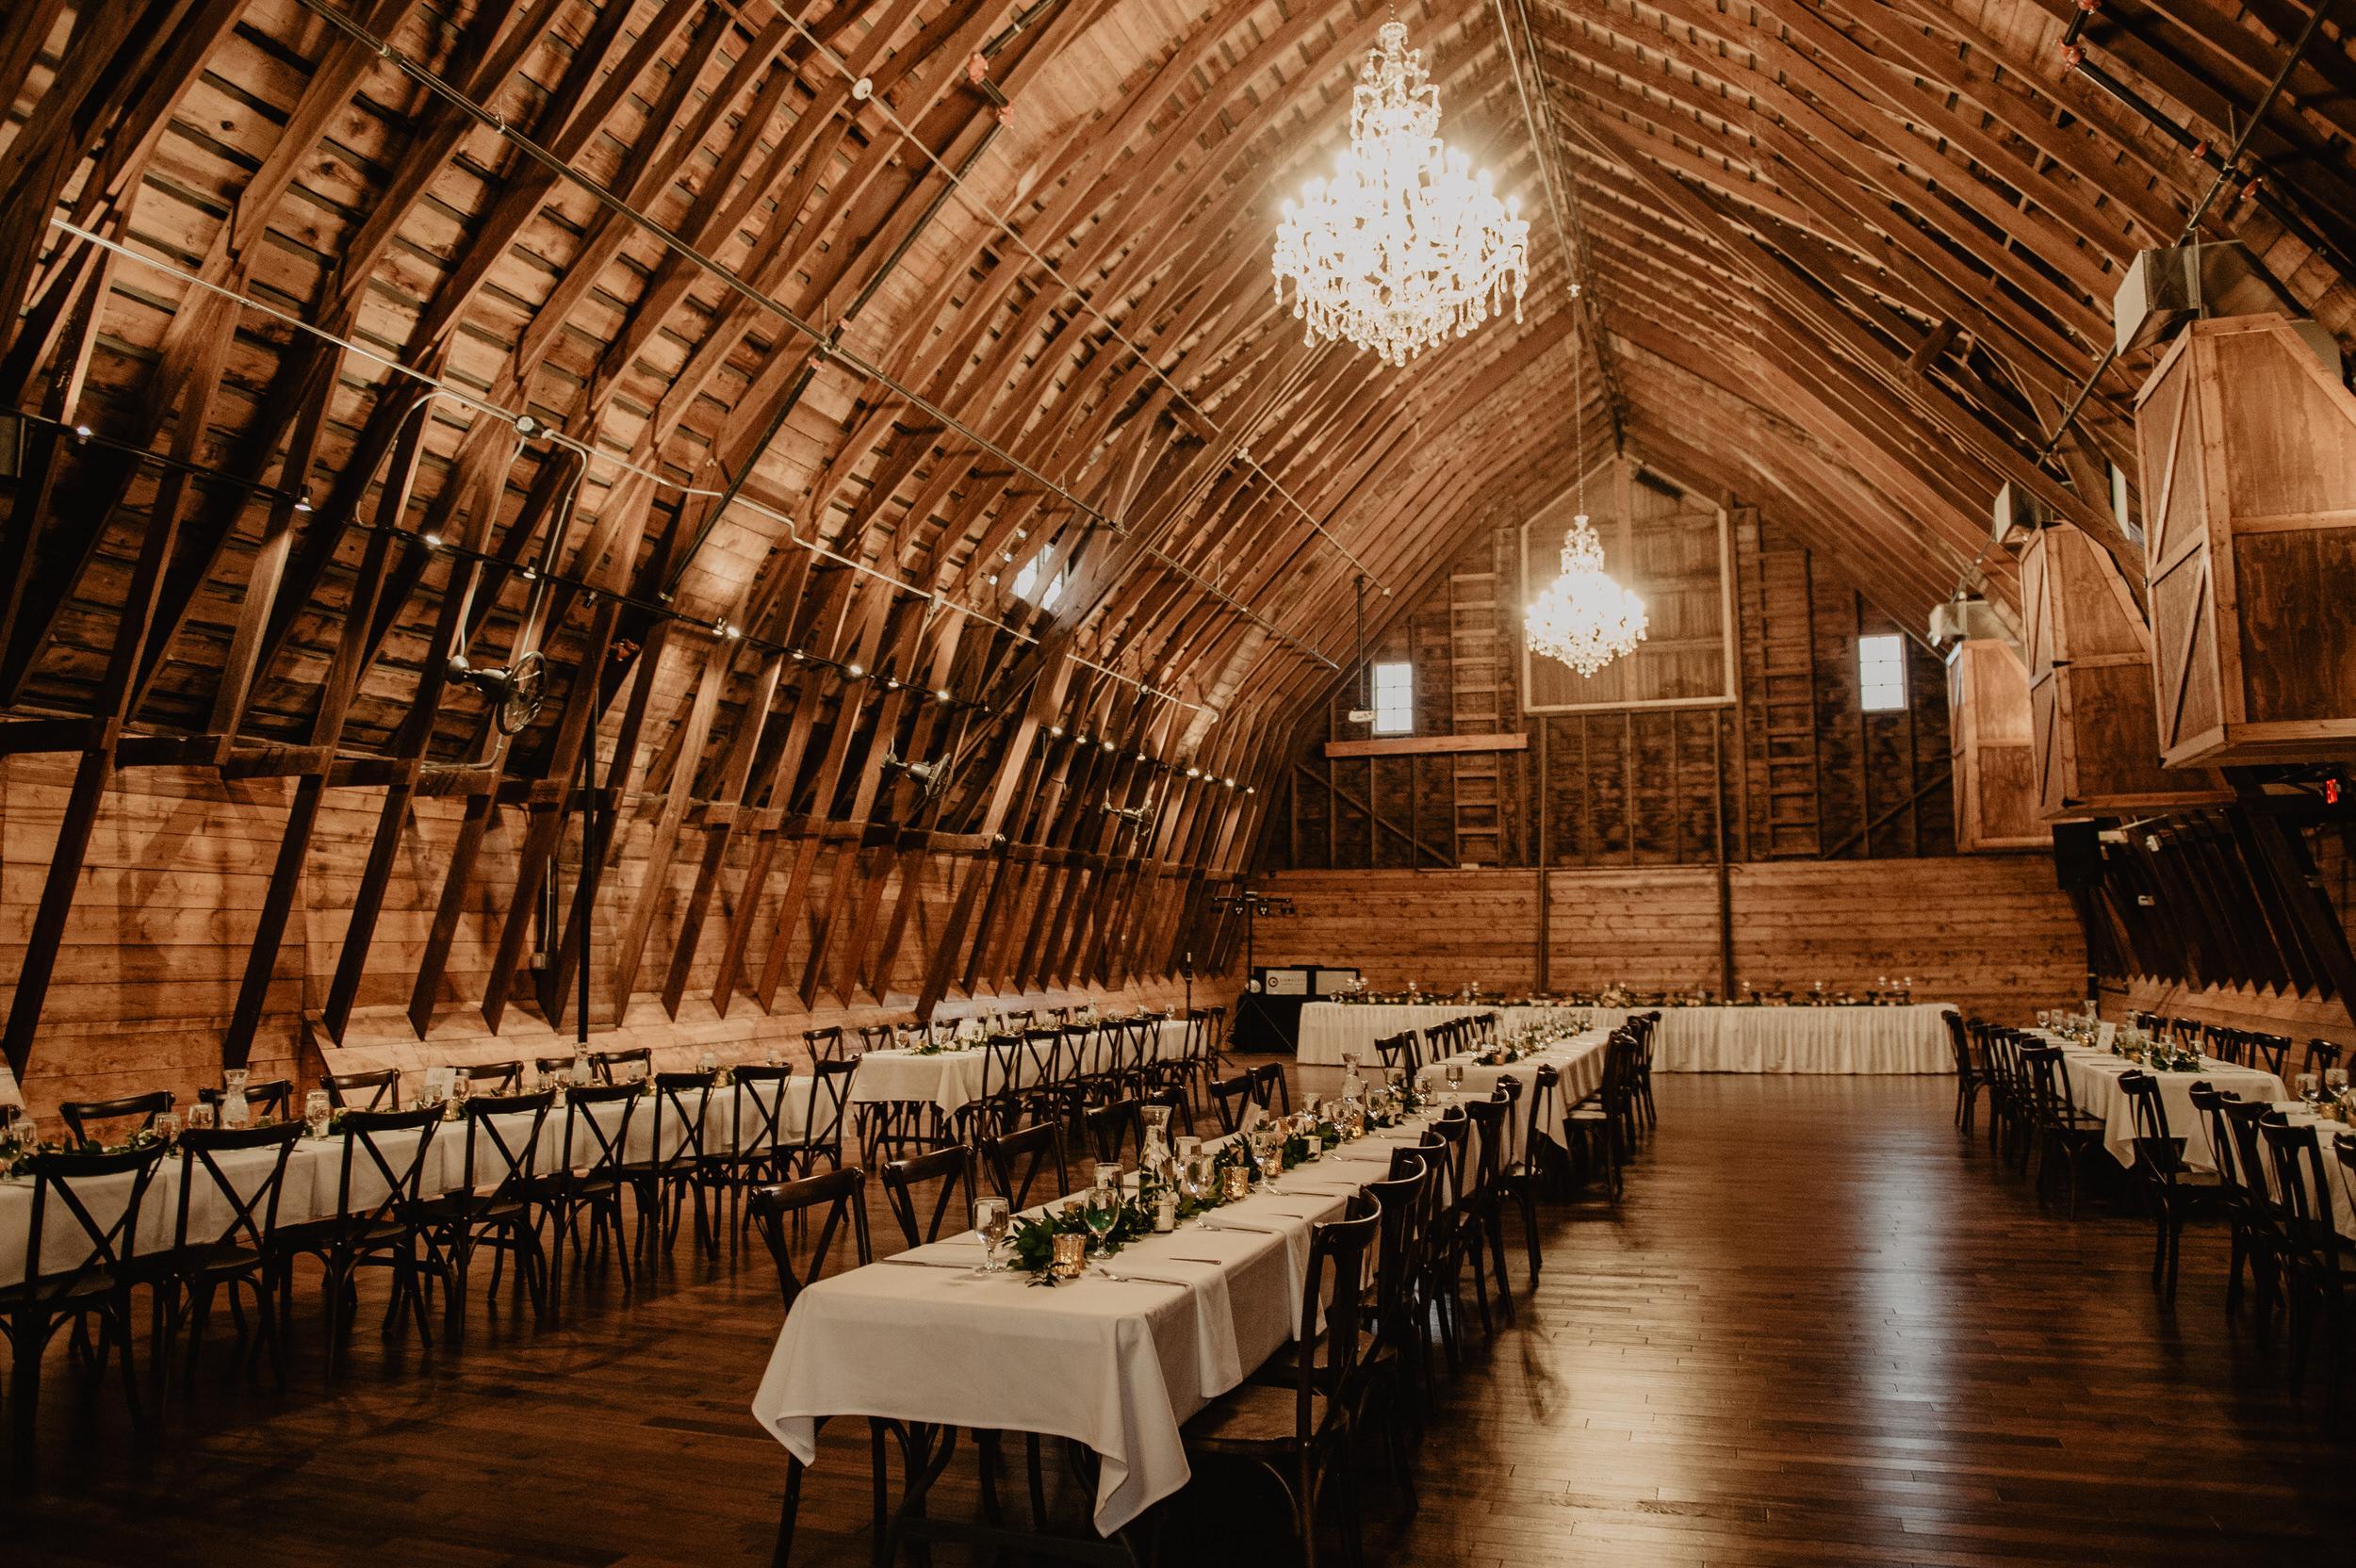 Barn Wedding Venues Near Me.Barn Wedding Venues In Nebraska Kaylie Sirek Nebraska